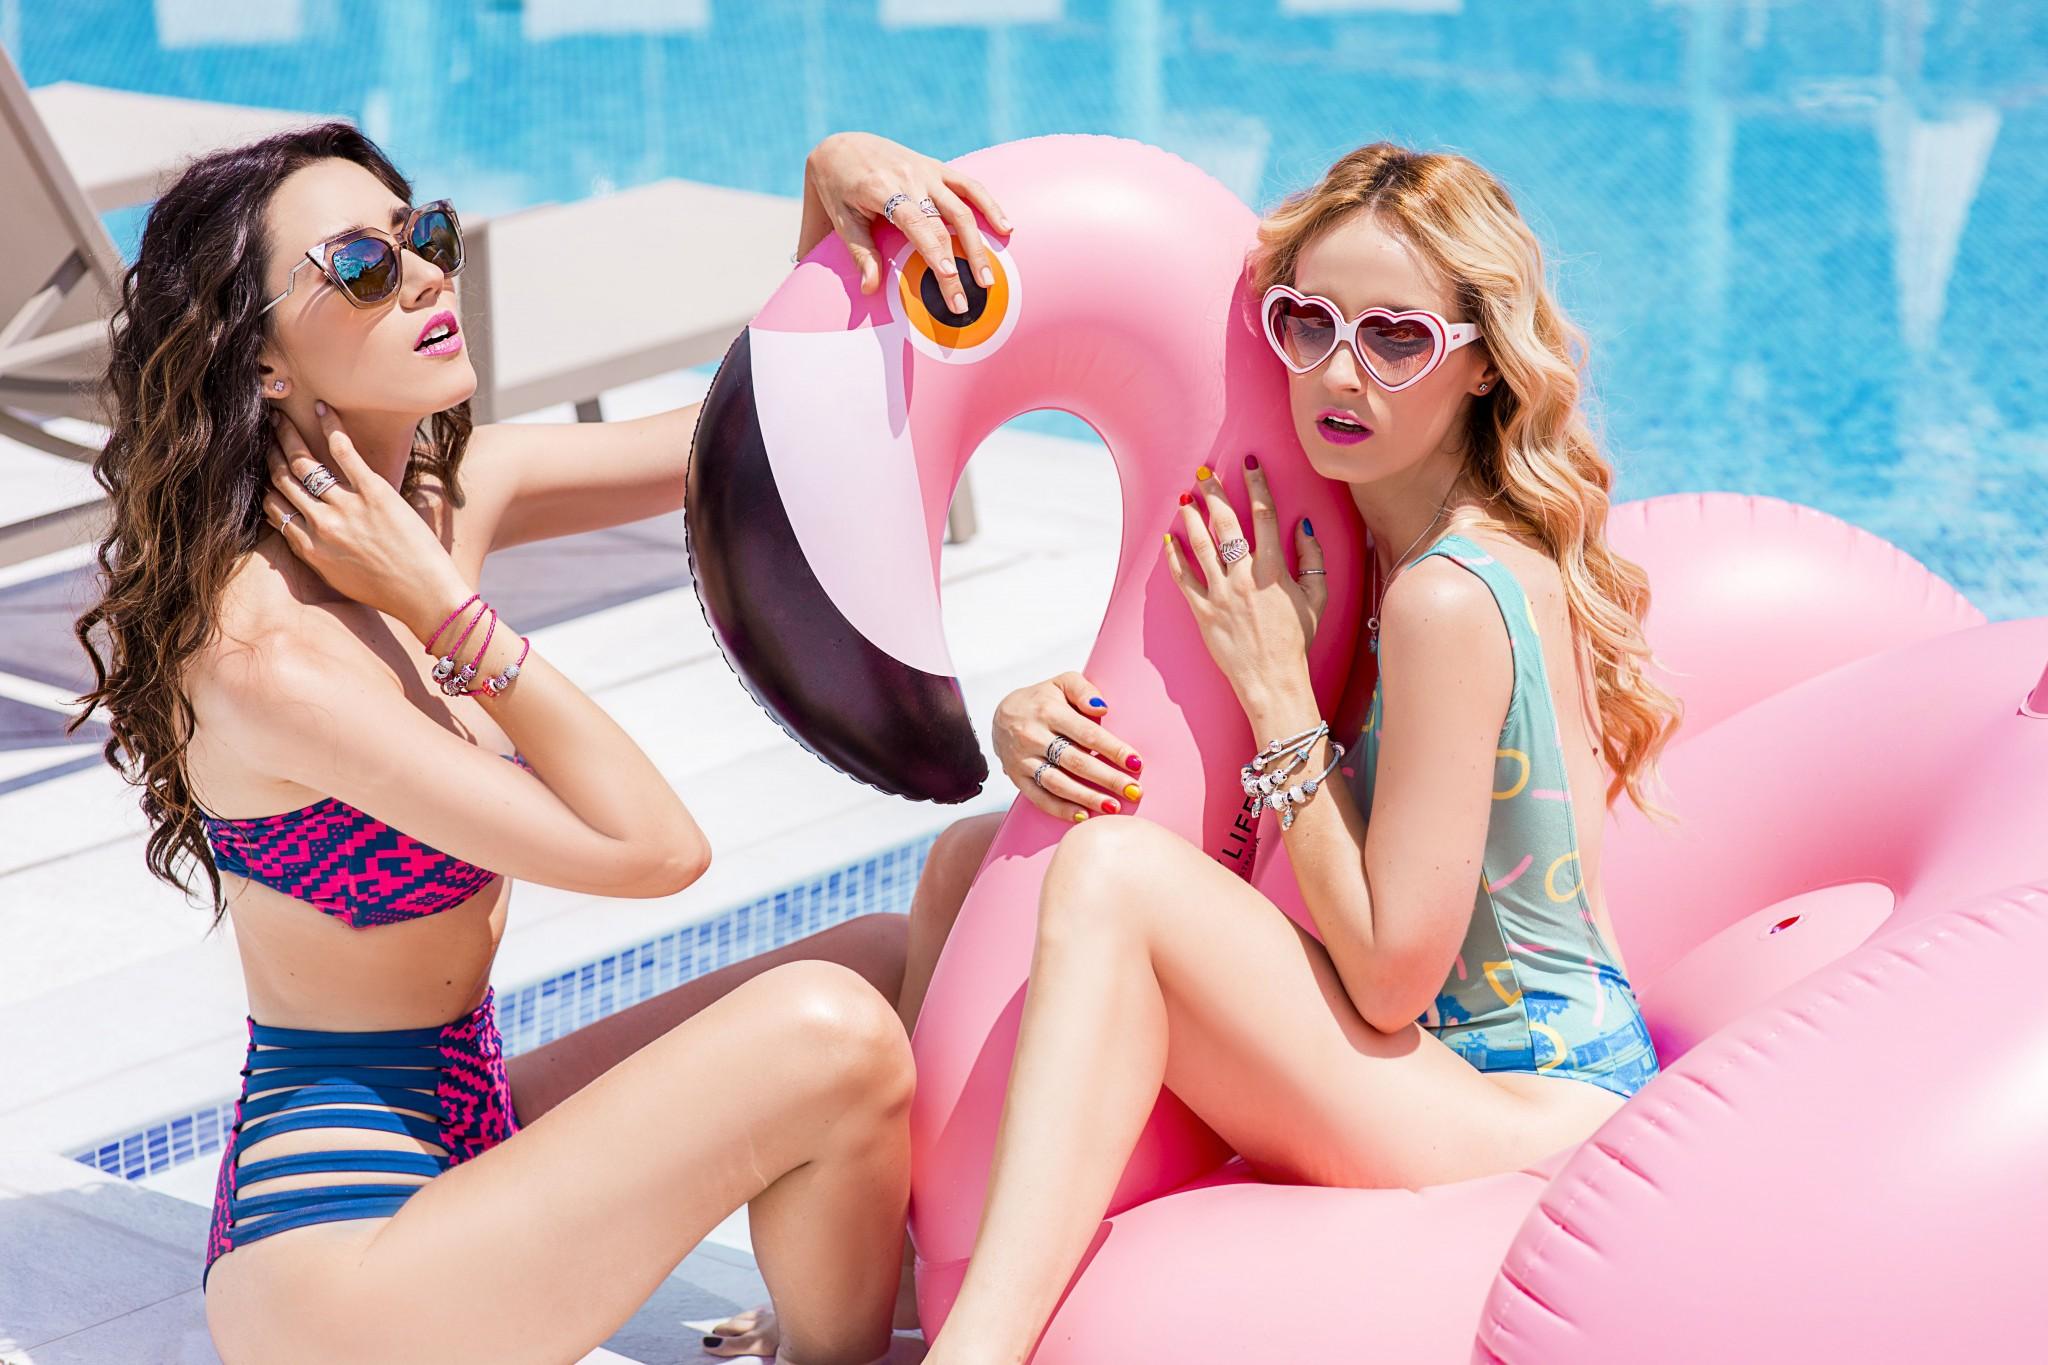 3fabulous_muses_pandora_summer2016_collection_youniverse_piscina